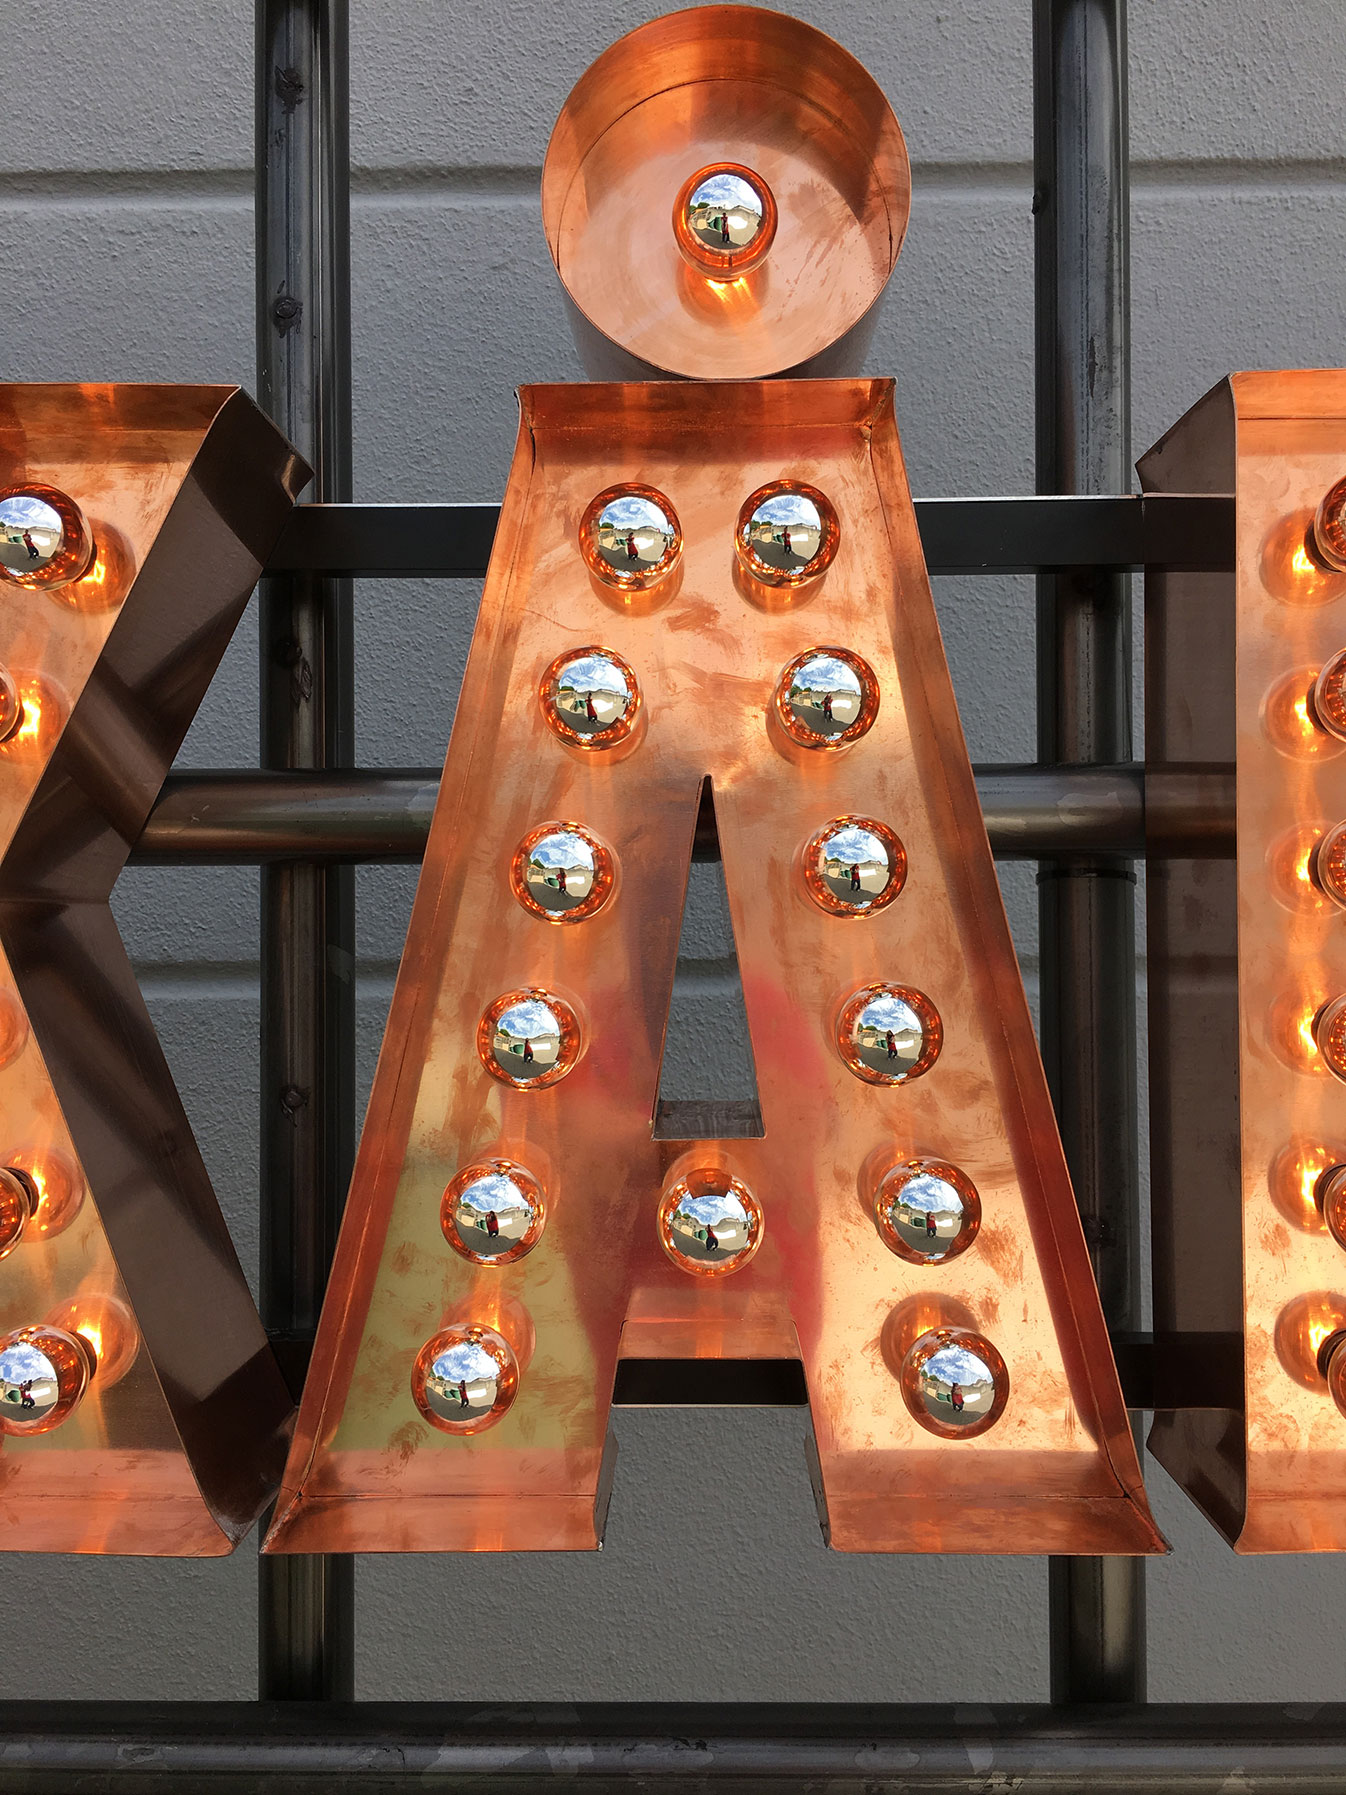 StilManipulation Absolut Elyx Copper Skål Display 2016